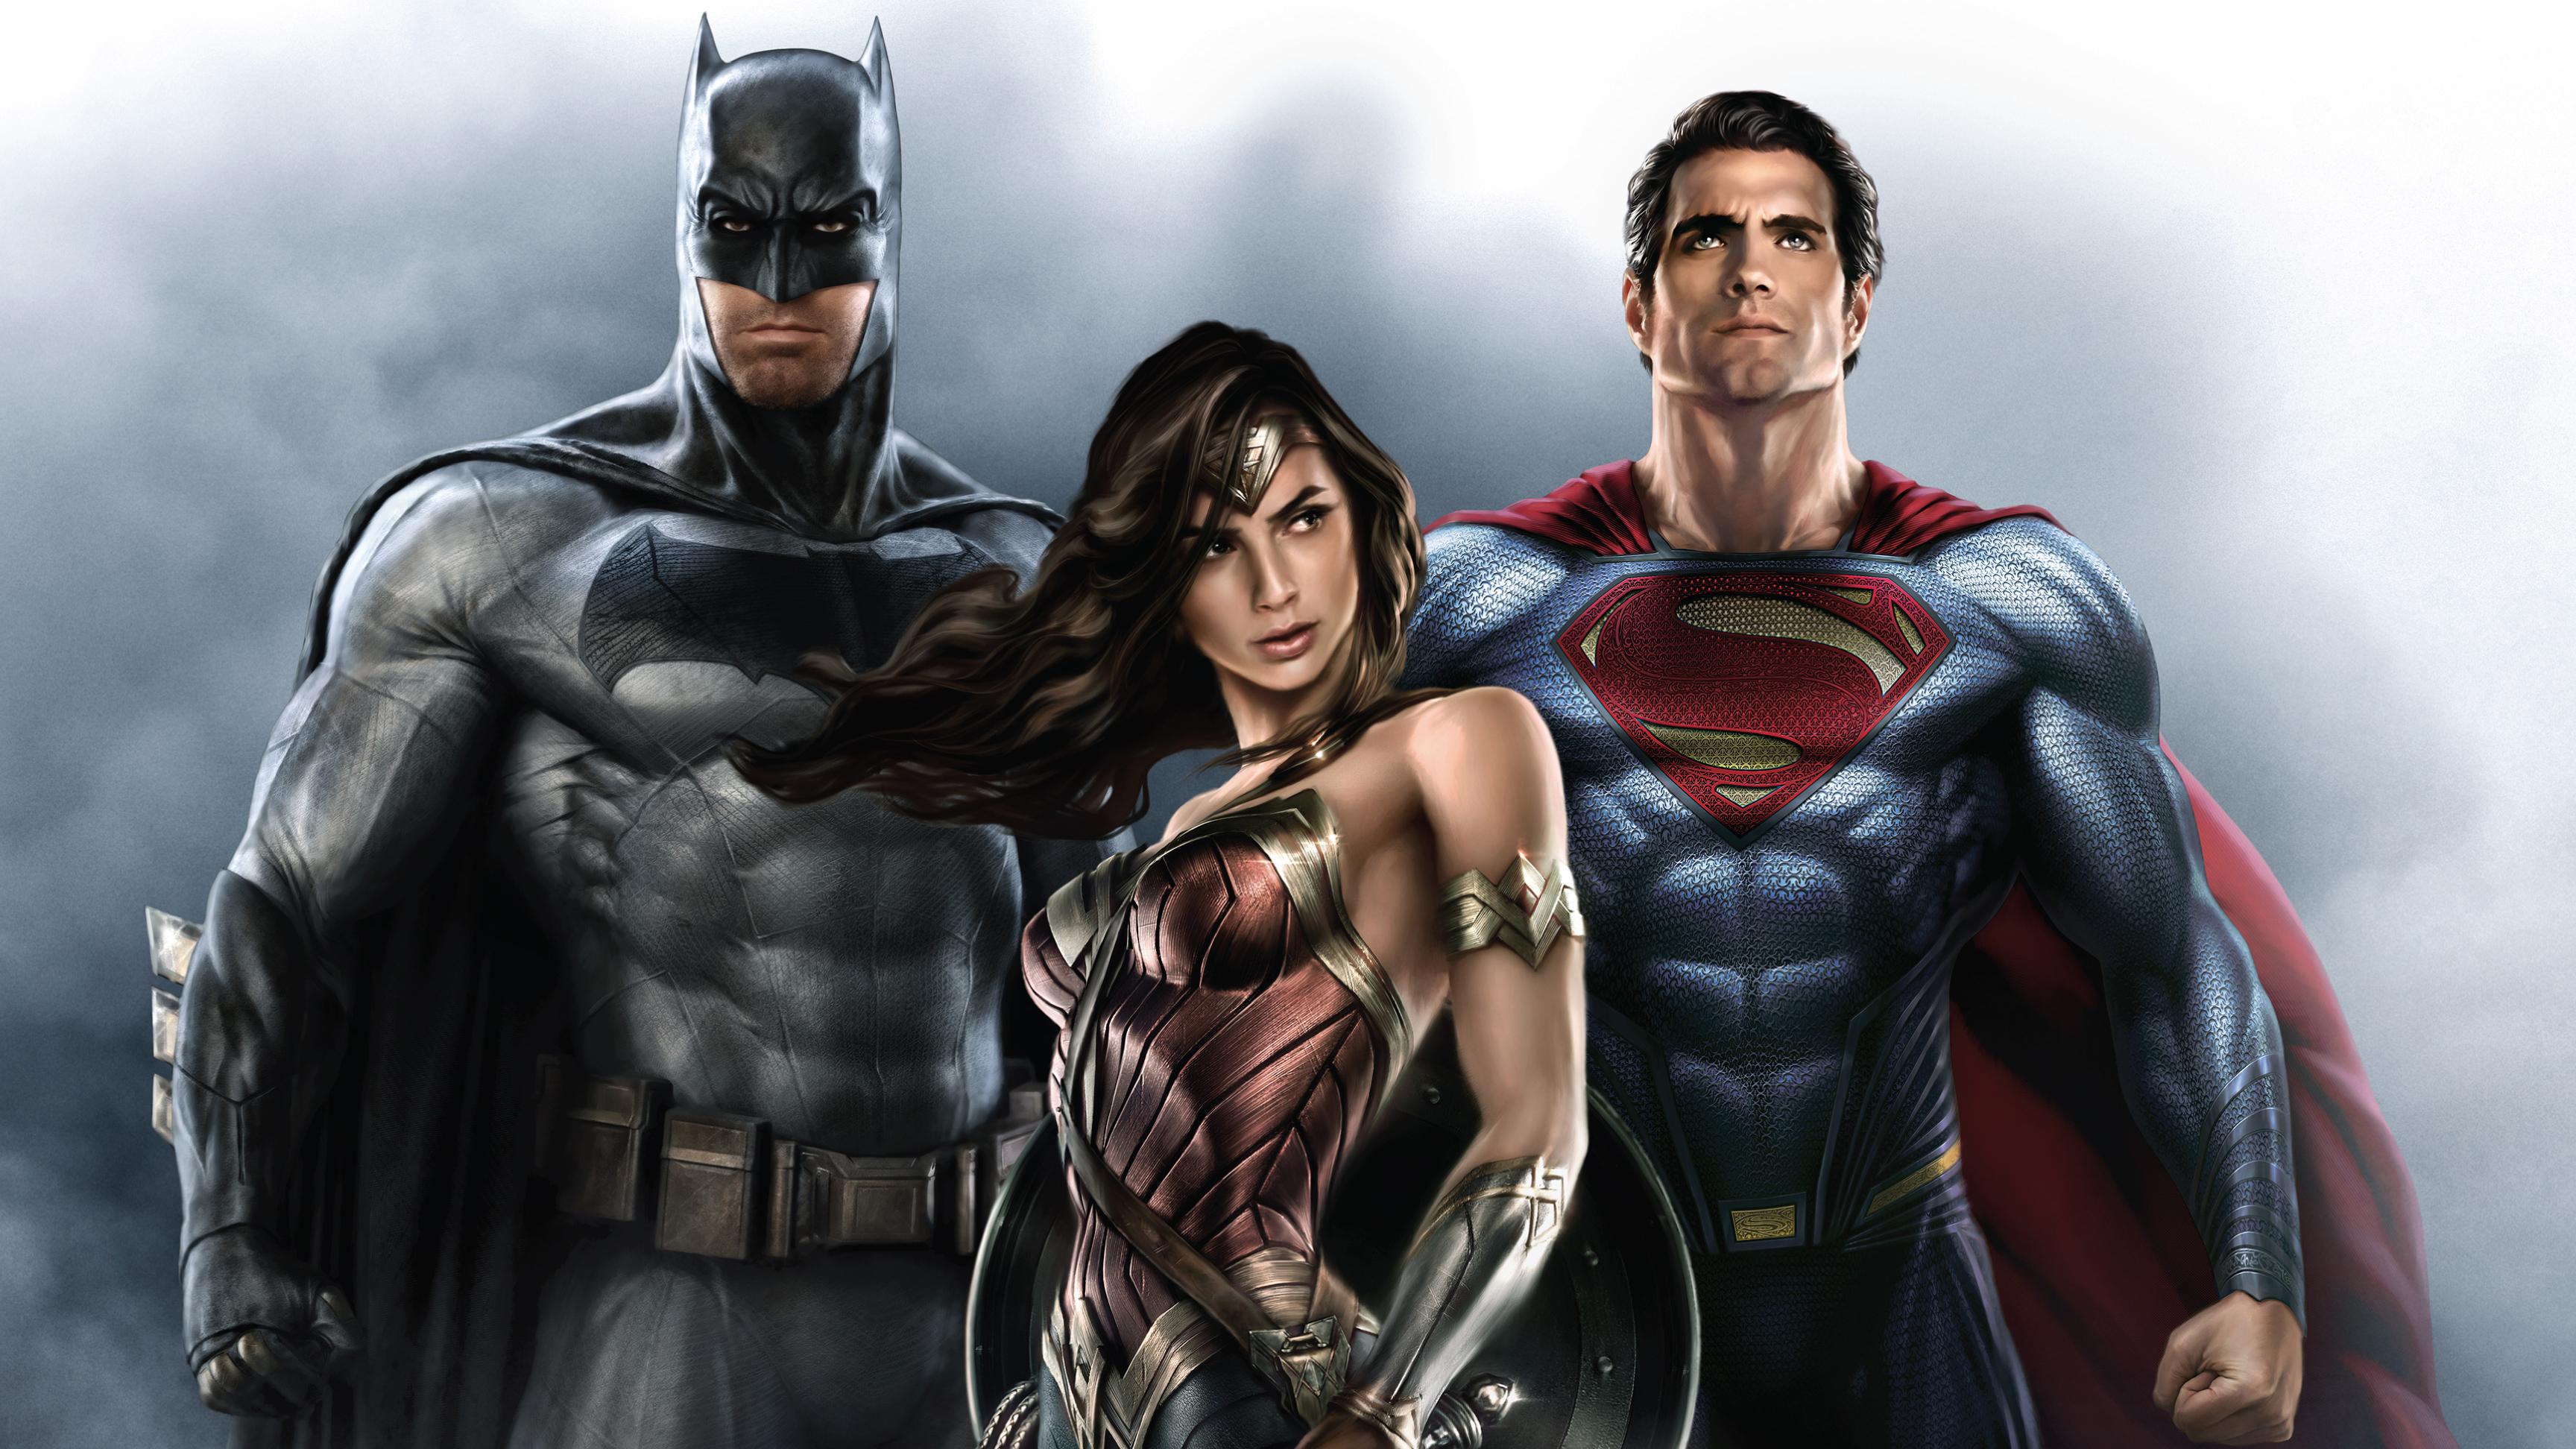 batman wonder woman superman 4k 1545866375 - Batman Wonder Woman Superman 4k - wonder woman wallpapers, superman wallpapers, superheroes wallpapers, hd-wallpapers, behance wallpapers, batman wallpapers, artwork wallpapers, artist wallpapers, 4k-wallpapers